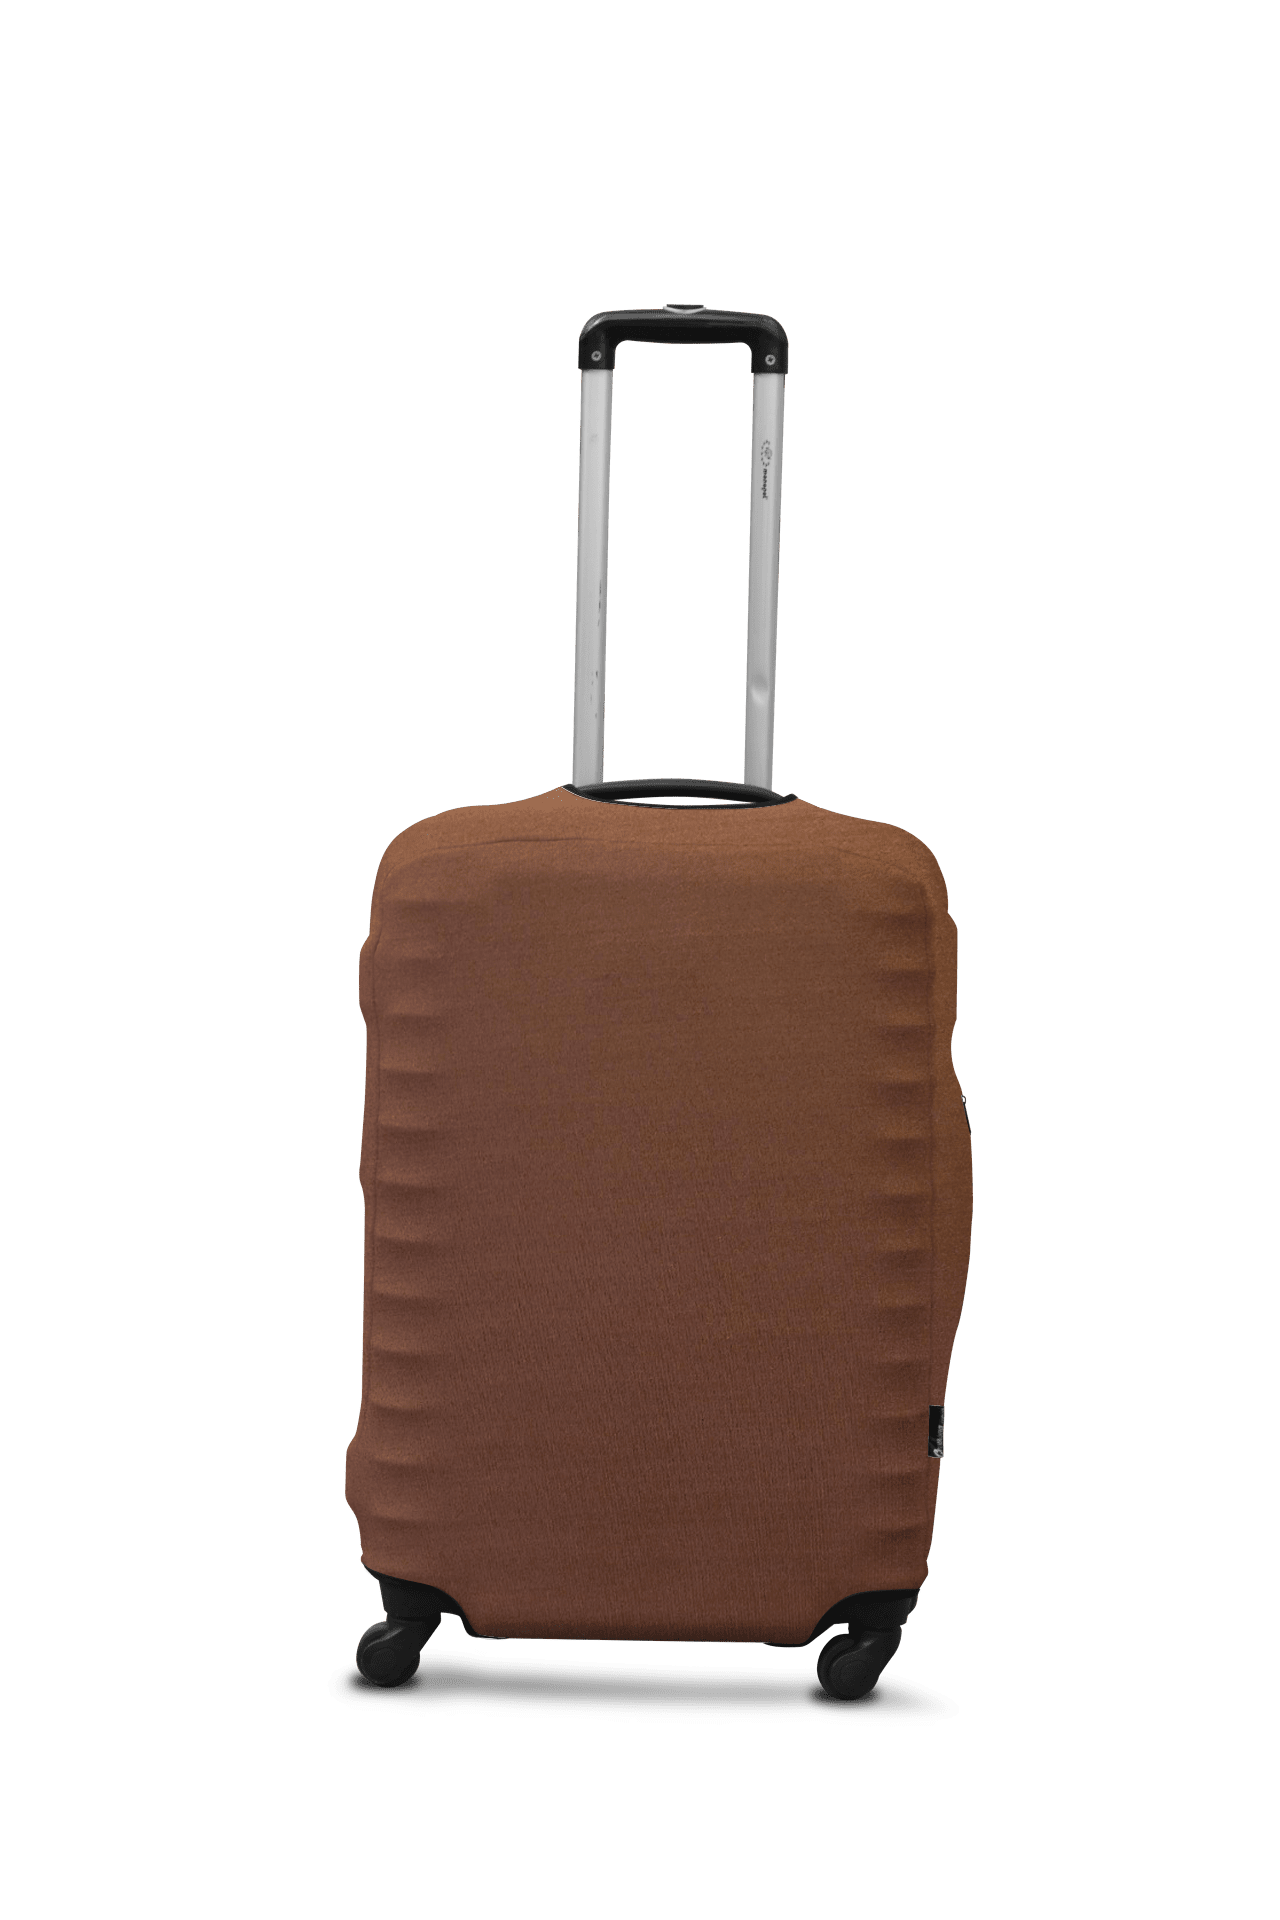 Husa pentru valiza daiving Cover DAWING M BROWN